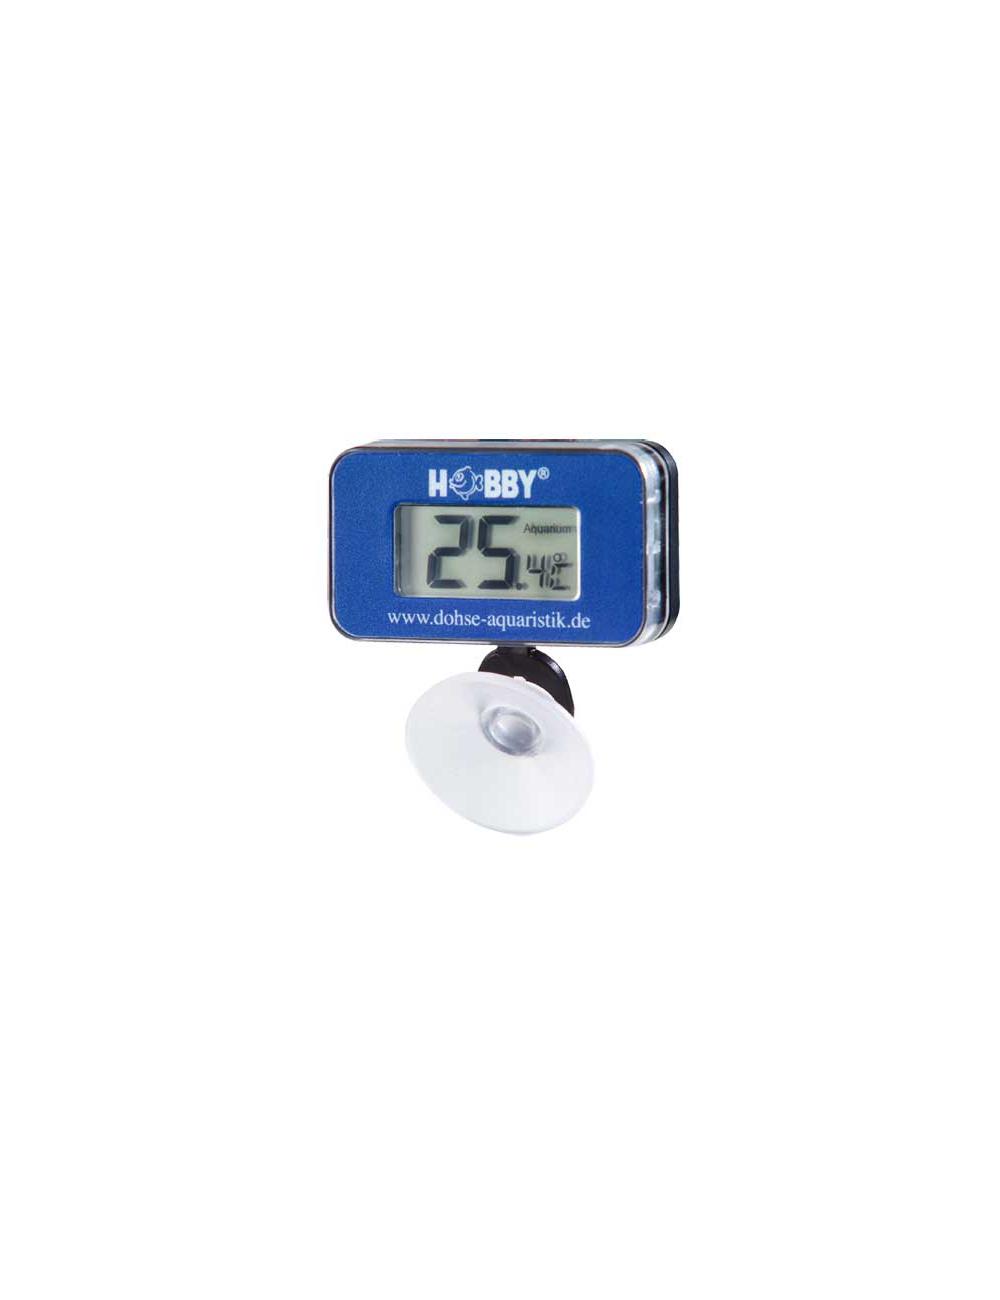 HOBBY - Thermomètre digital pour aquarium